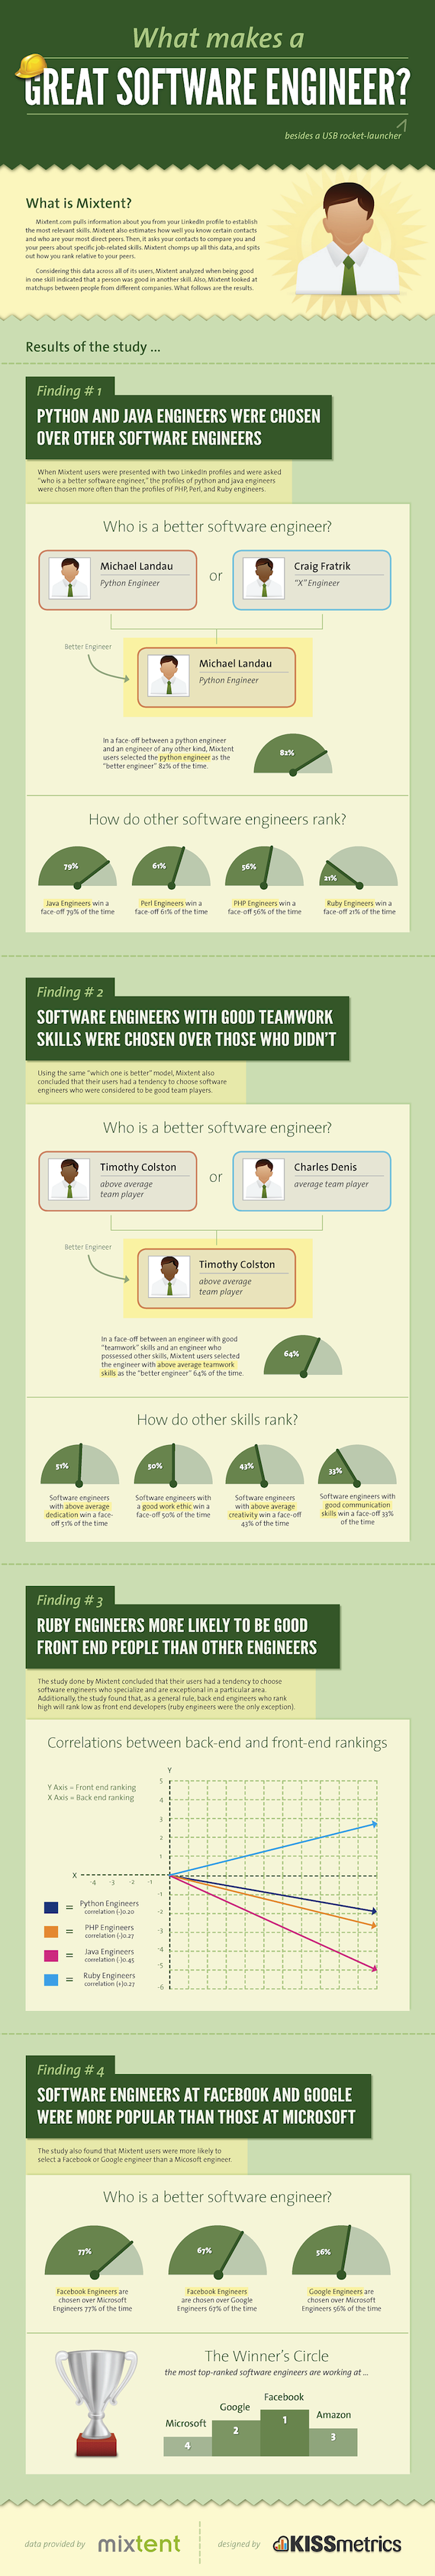 pin by perrine crampton on infographics